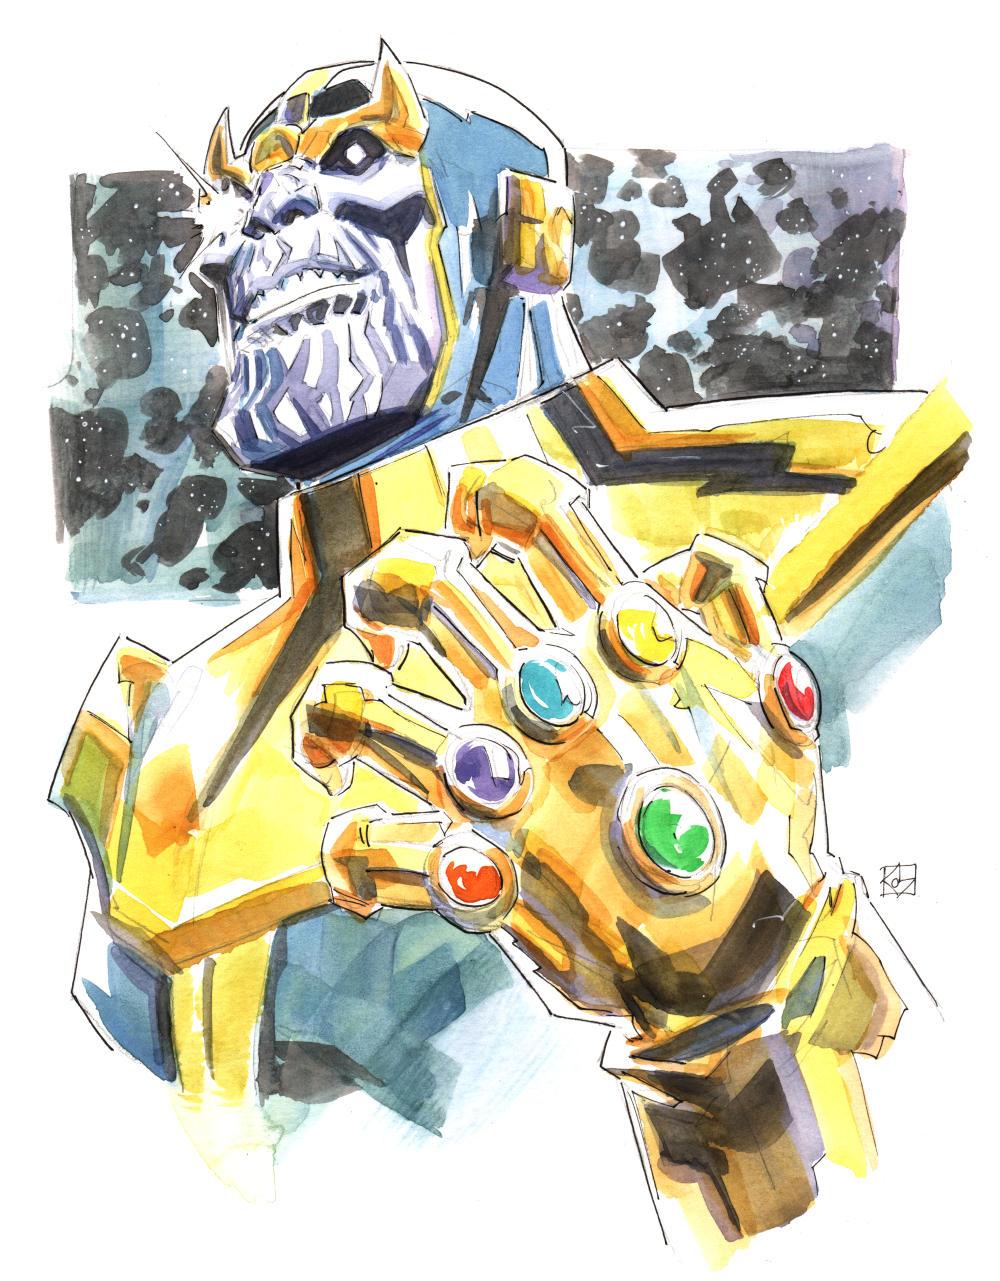 Thanos sketch by deankotz